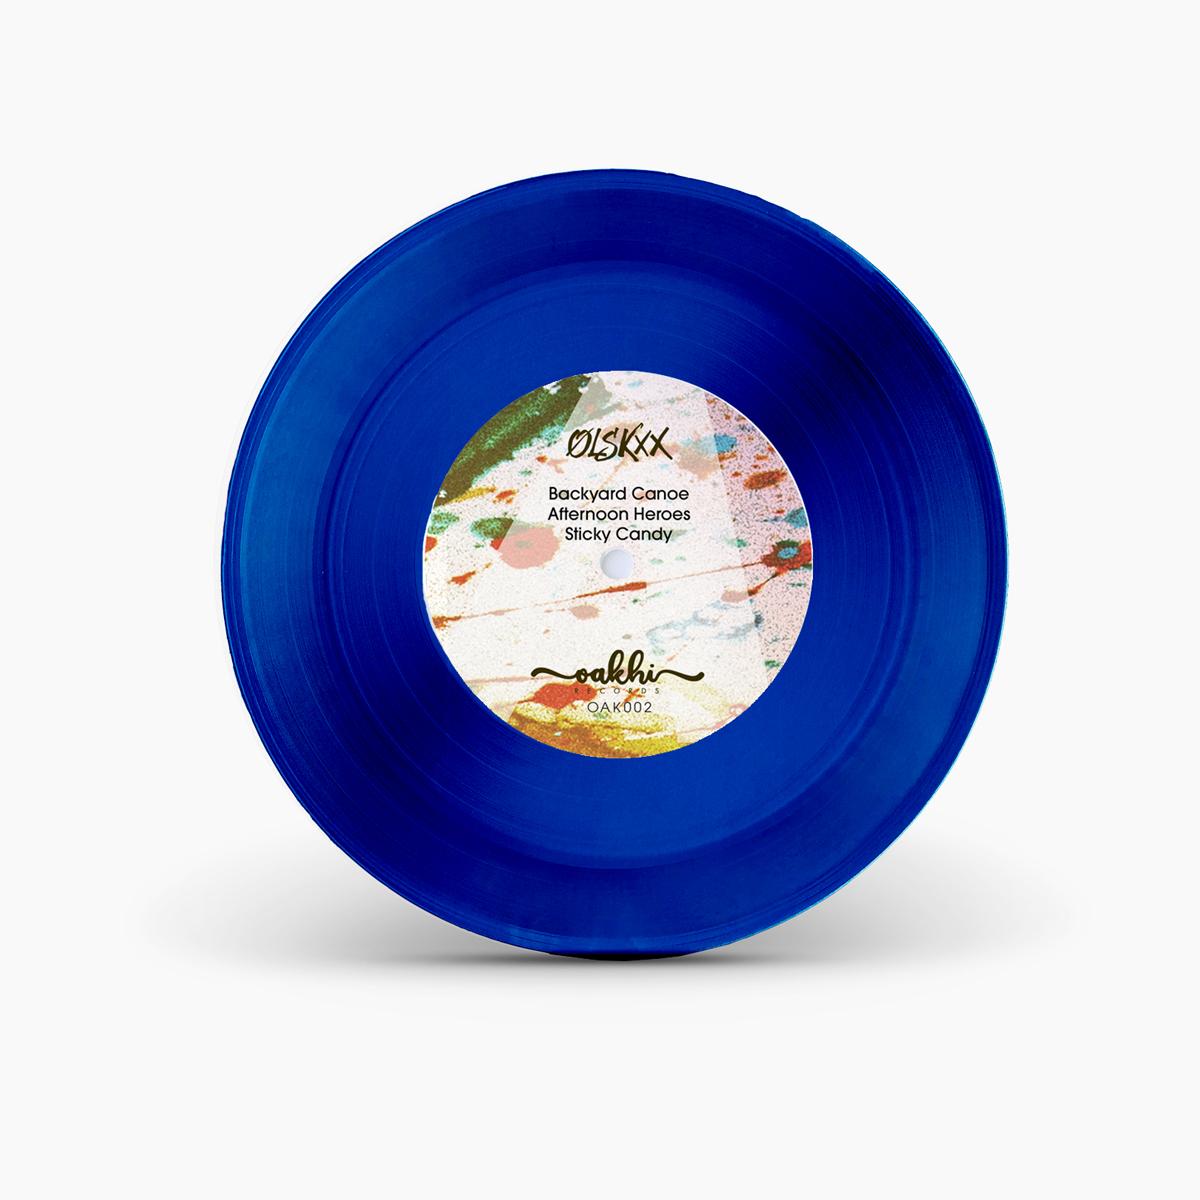 ØLSKXX - DIY EP - Traslucent Coloured Limited Edition 7